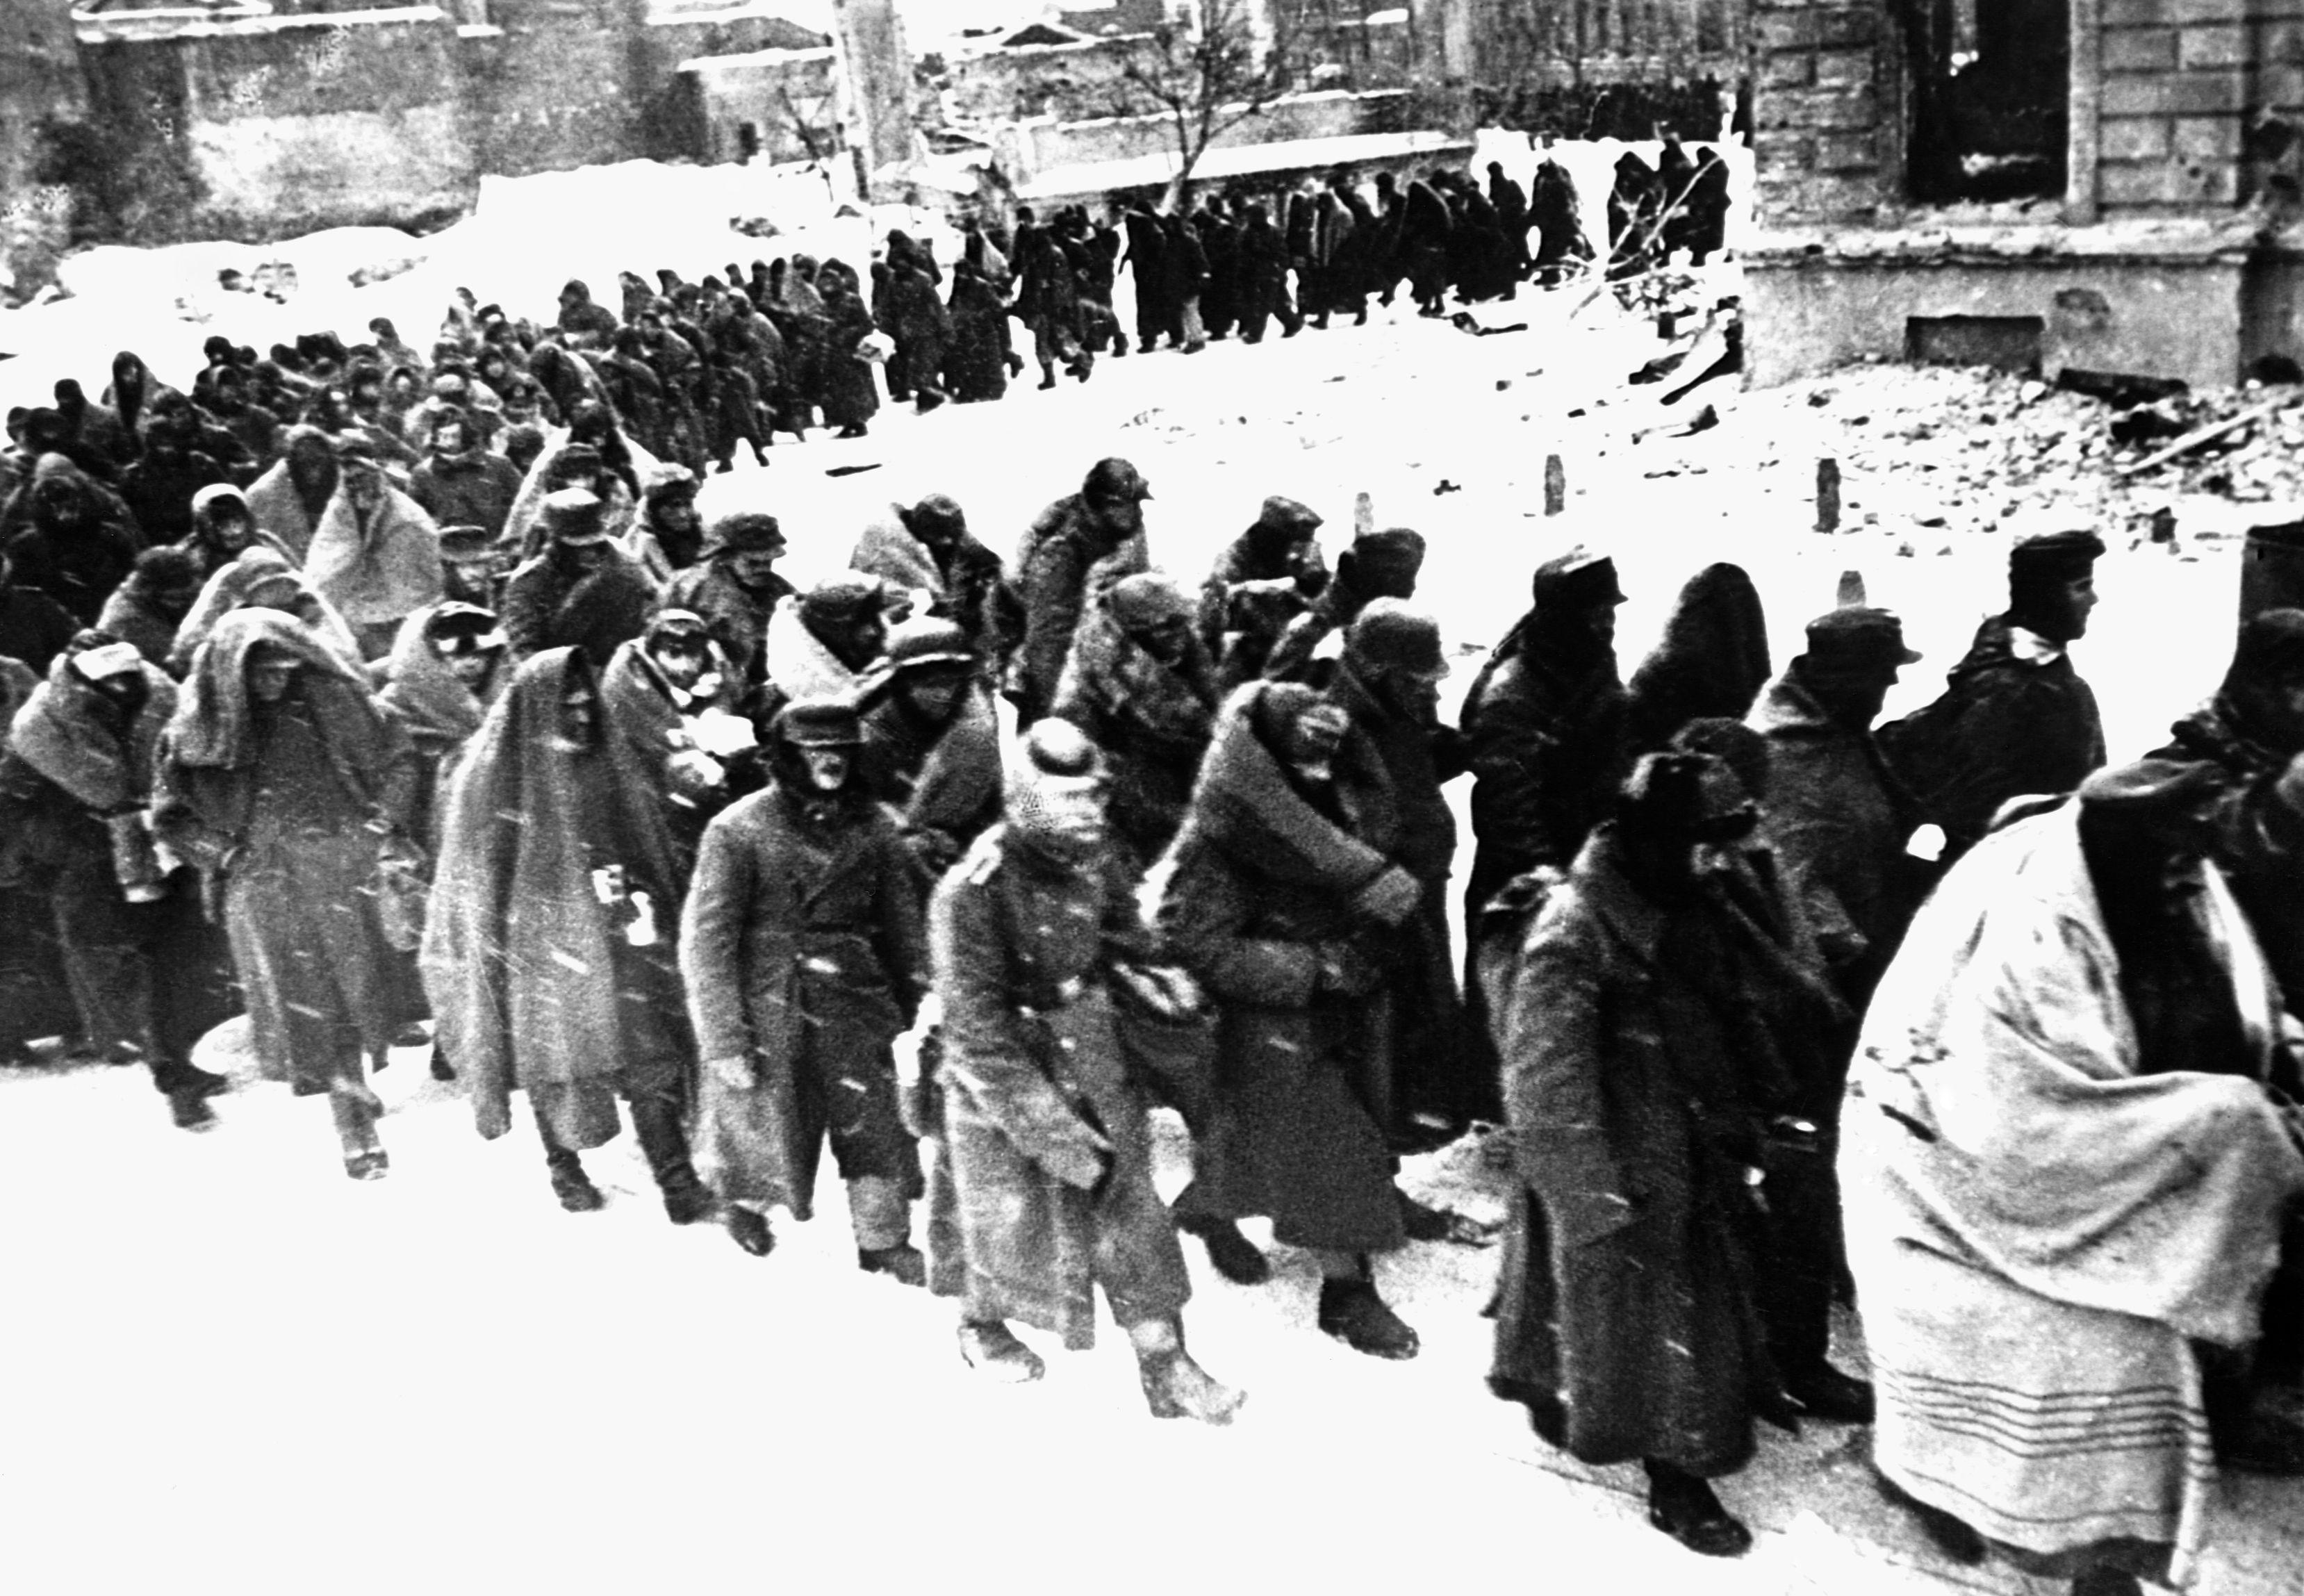 German POWs in Stalingrad